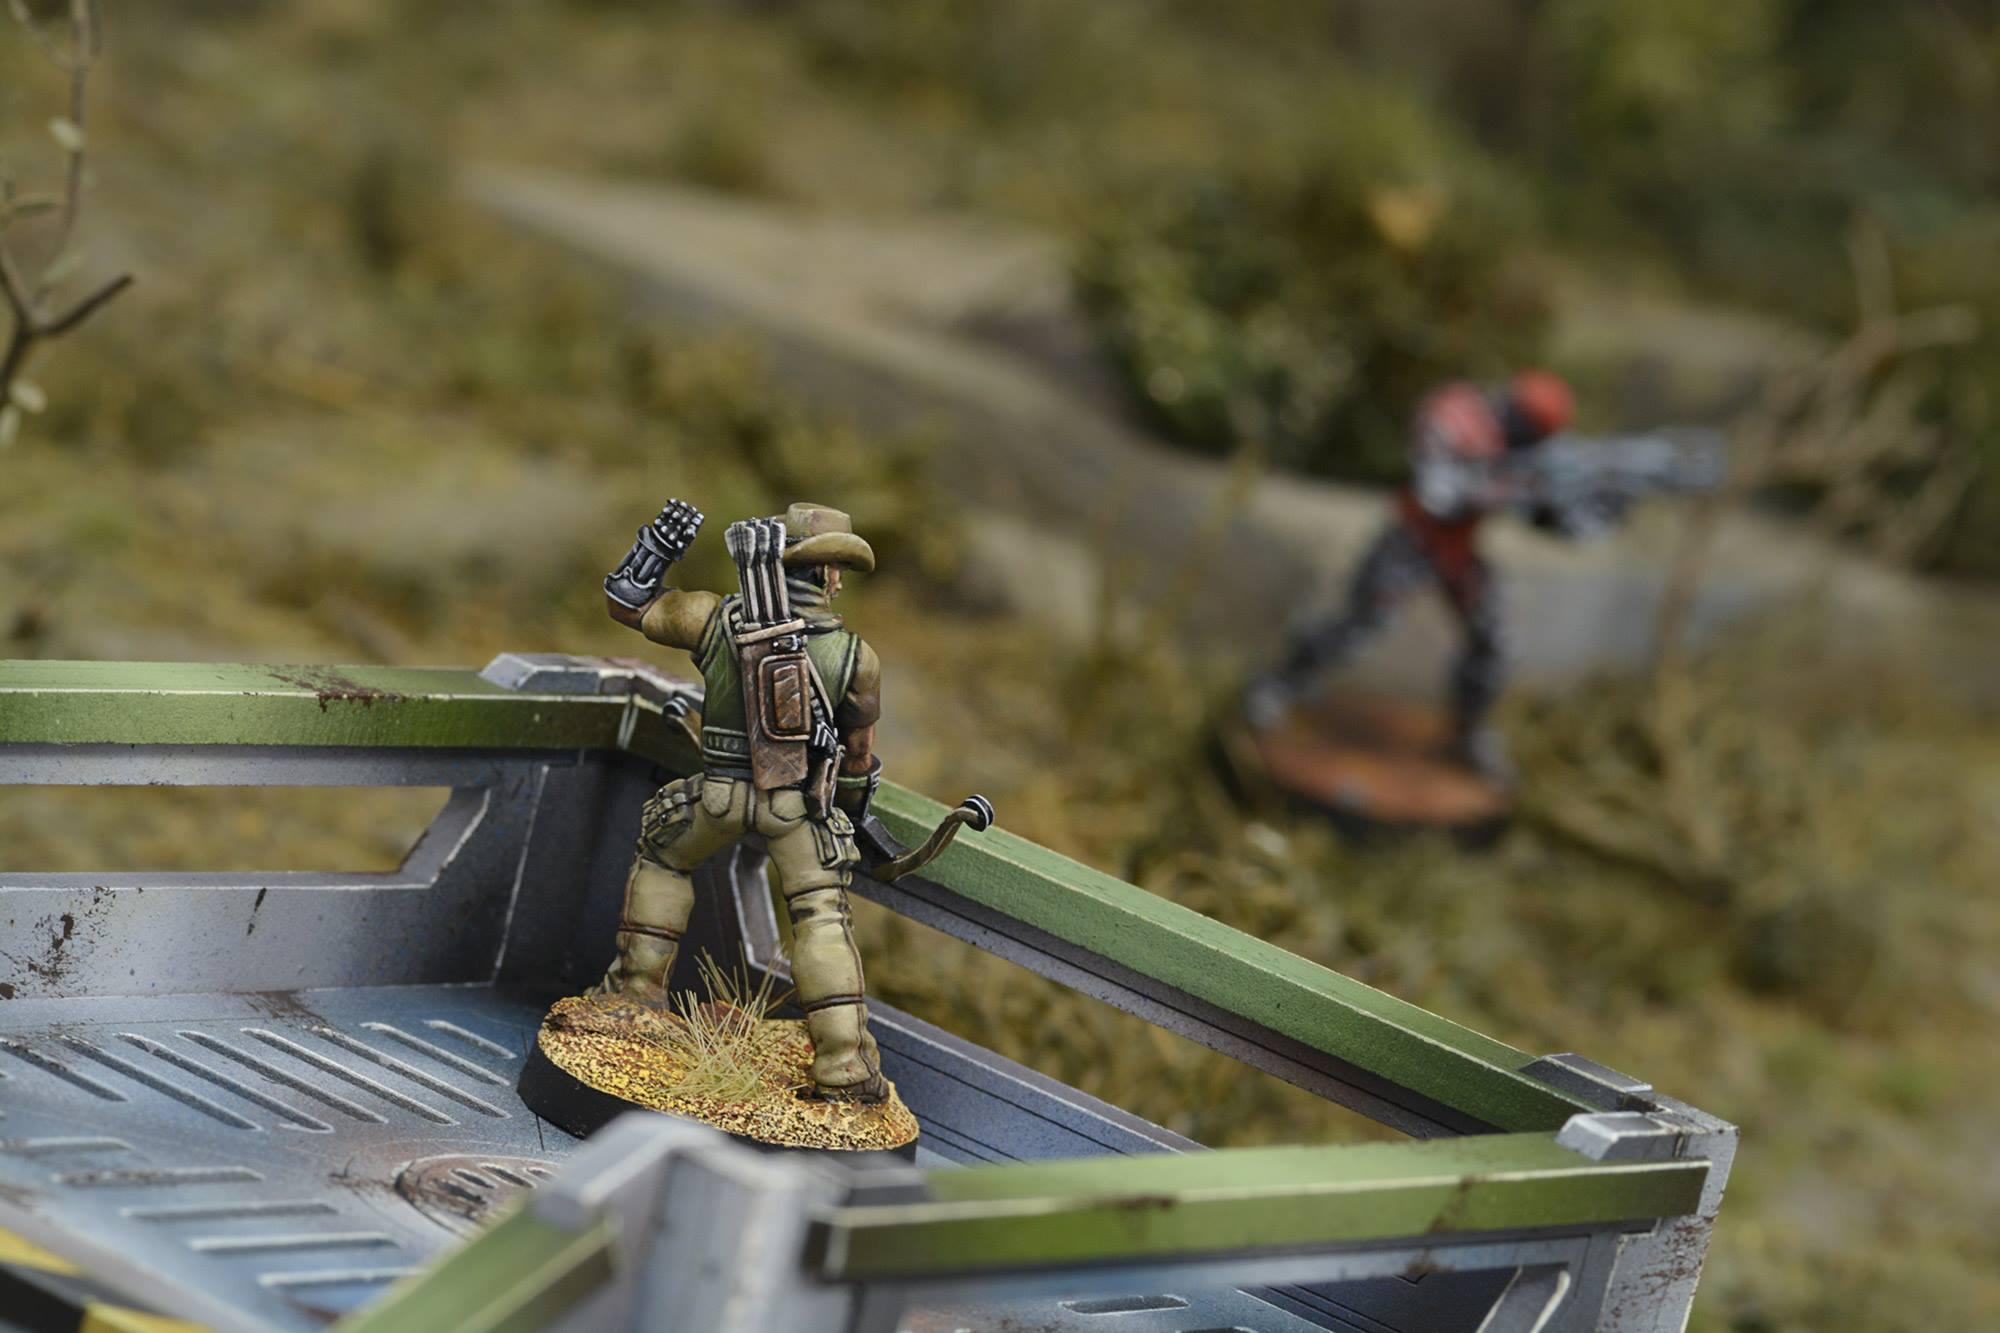 Hardcases-2nd-Irregular-Frontiersmen-Battalion-Tactical-Bow-Rear